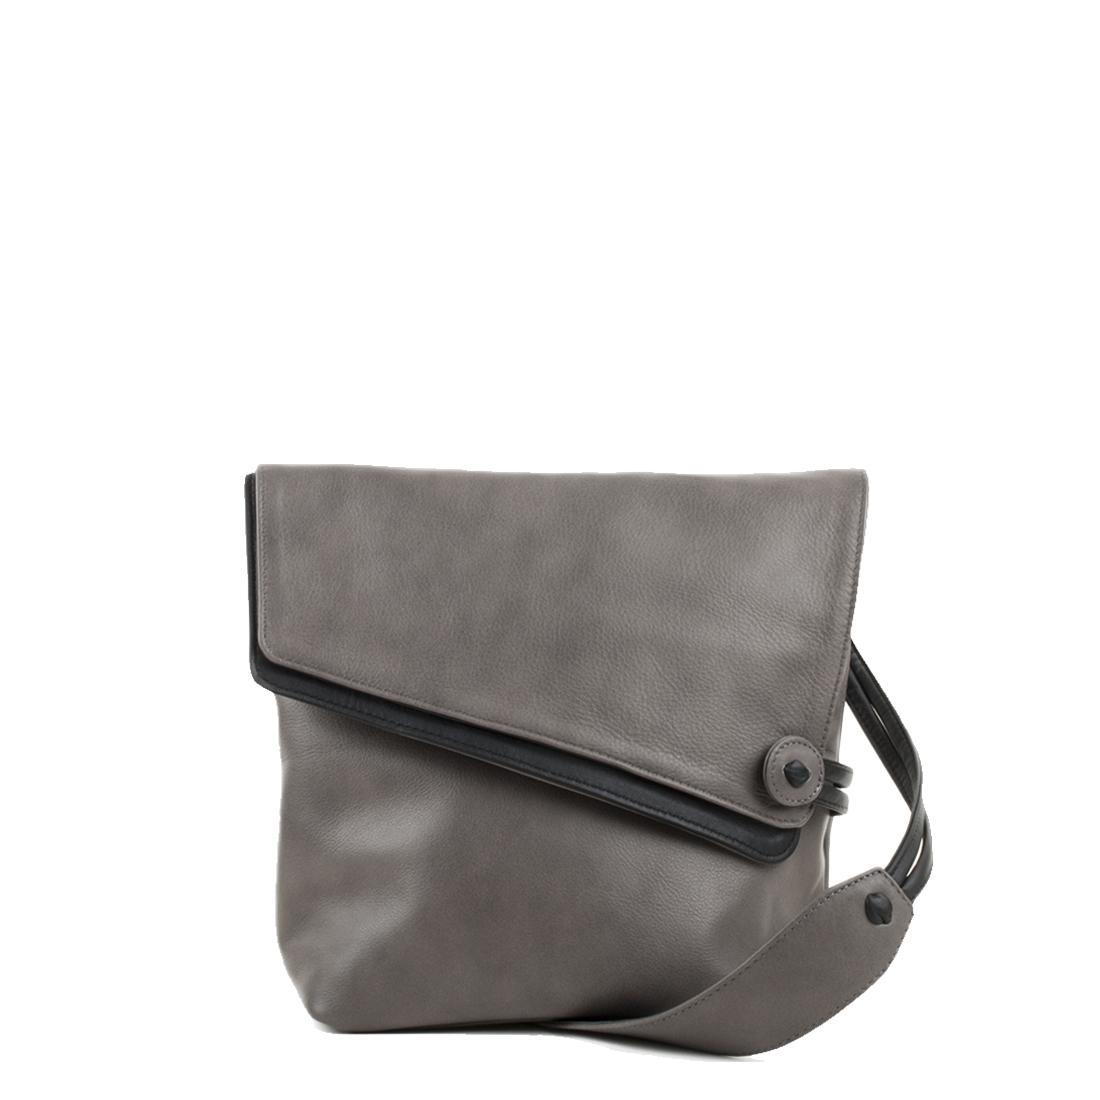 Louise Grigio Across Body Leather Bag